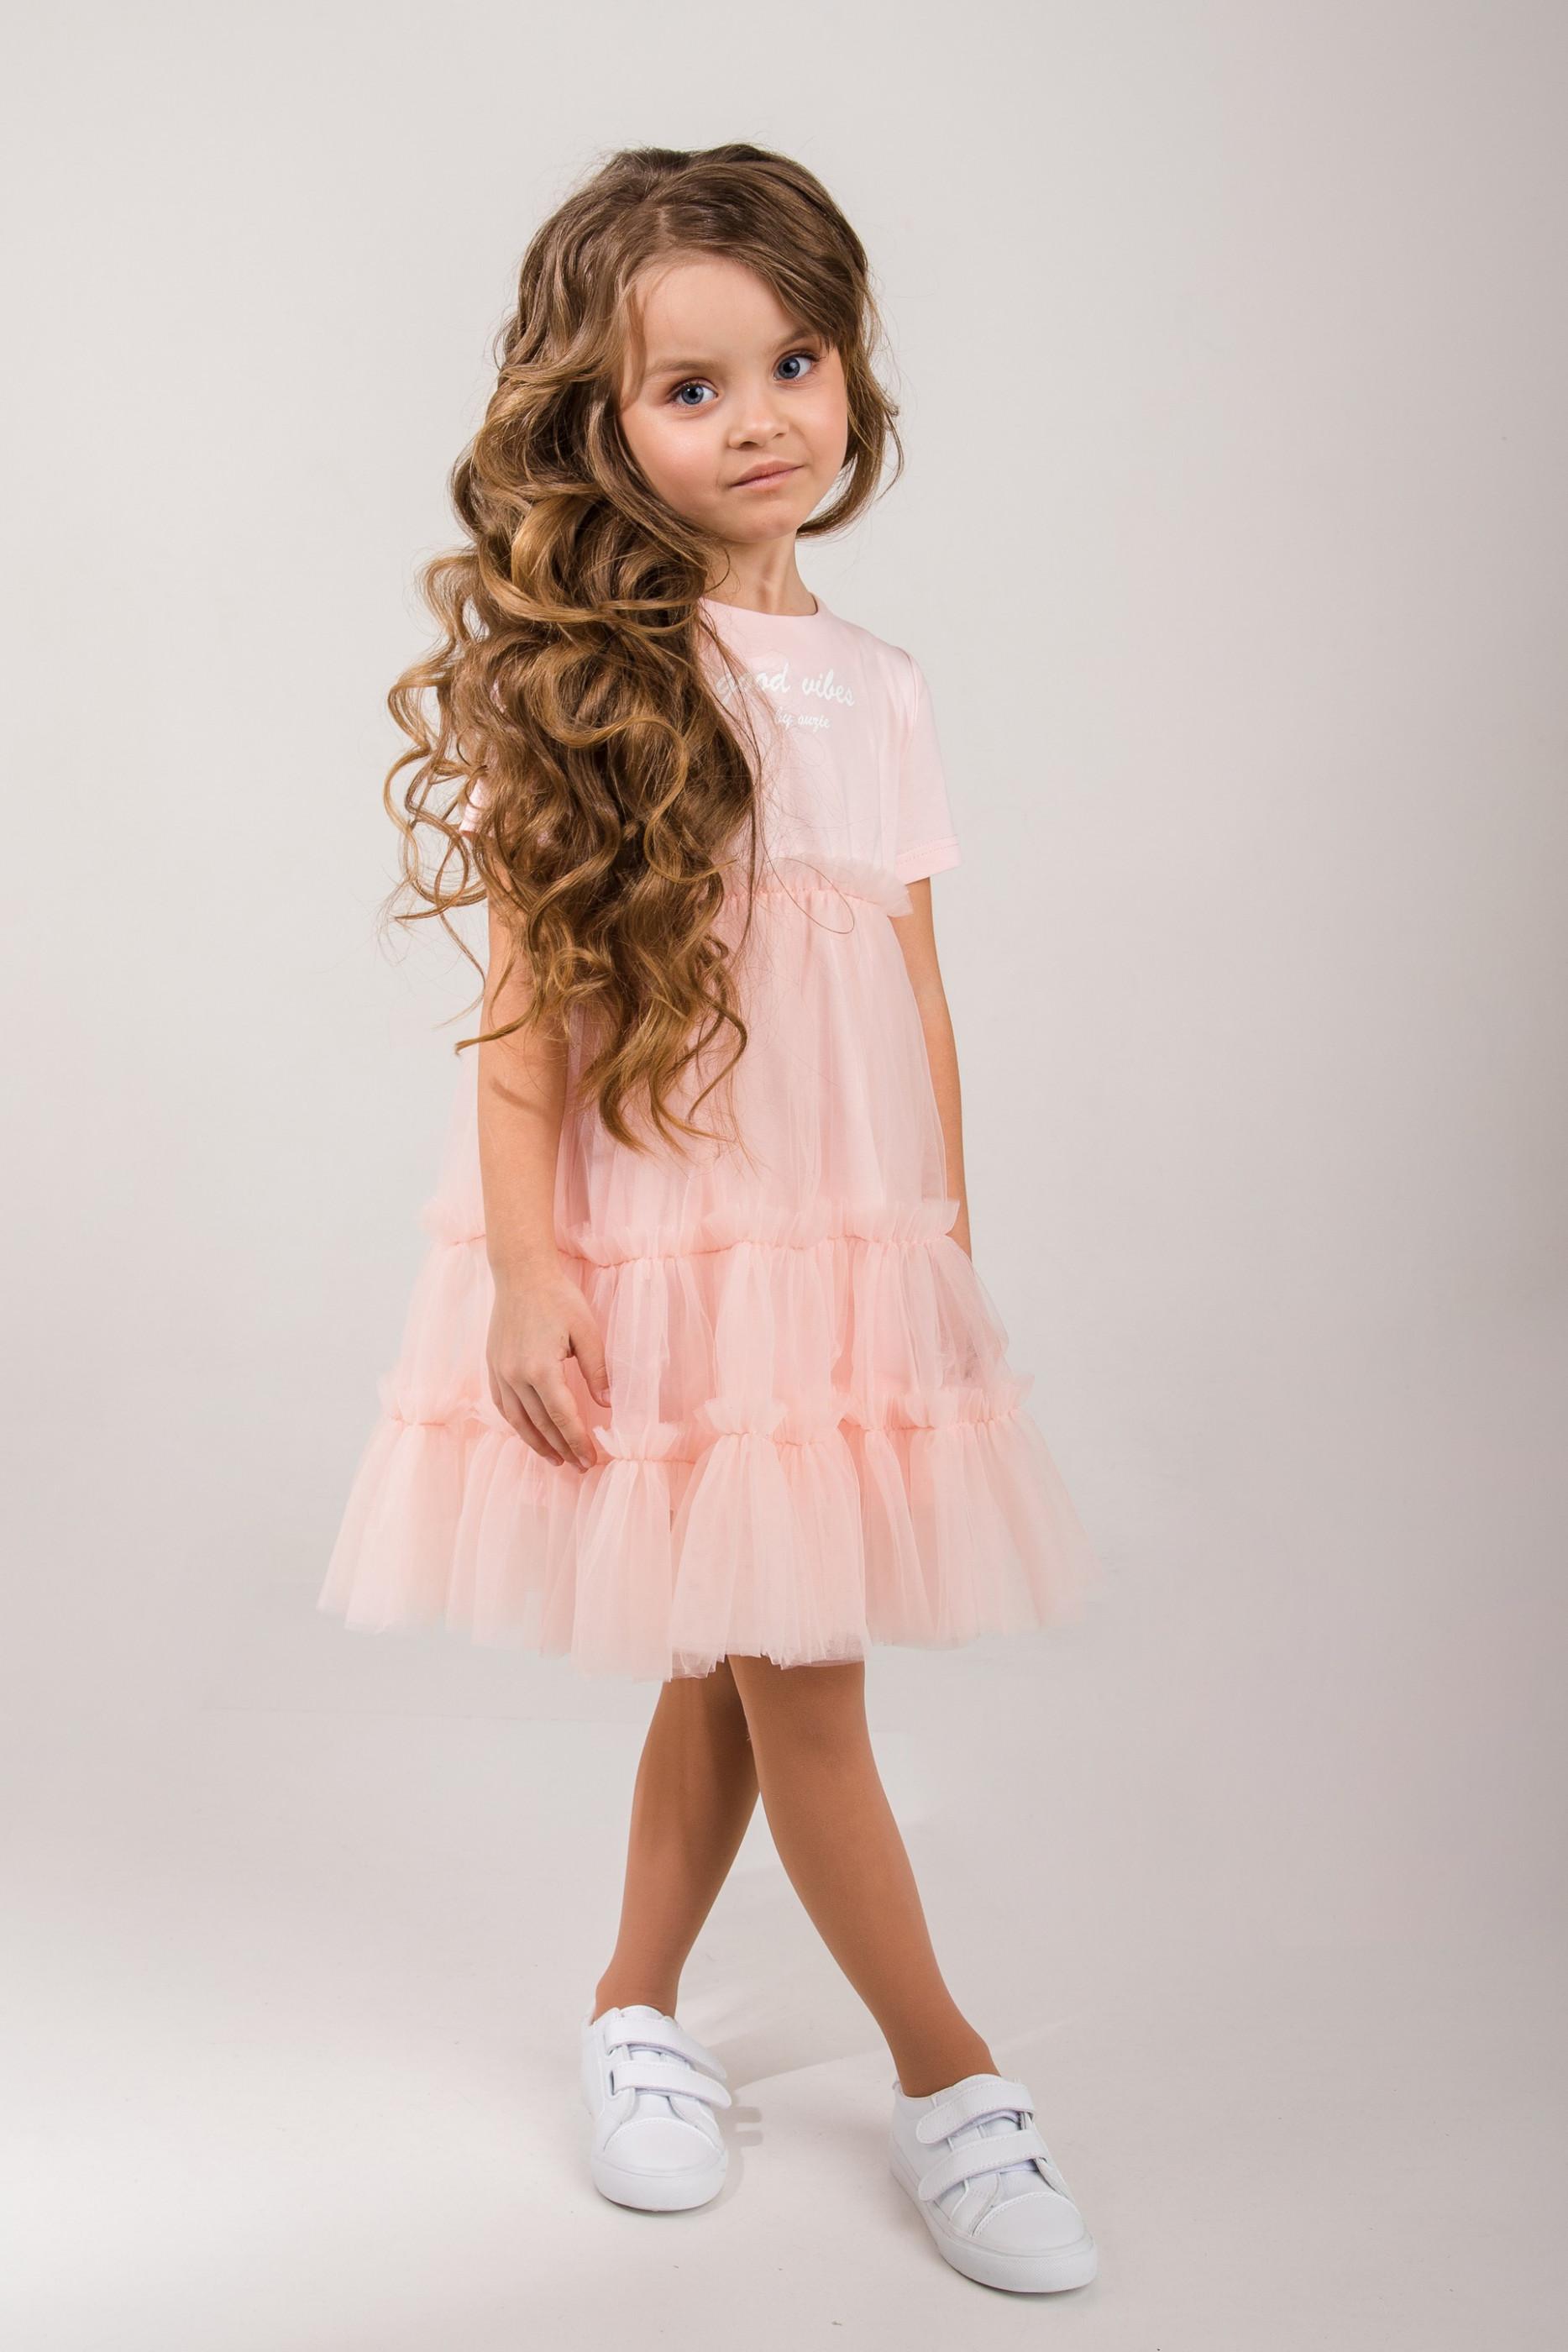 Плаття Шелбі, фото №5